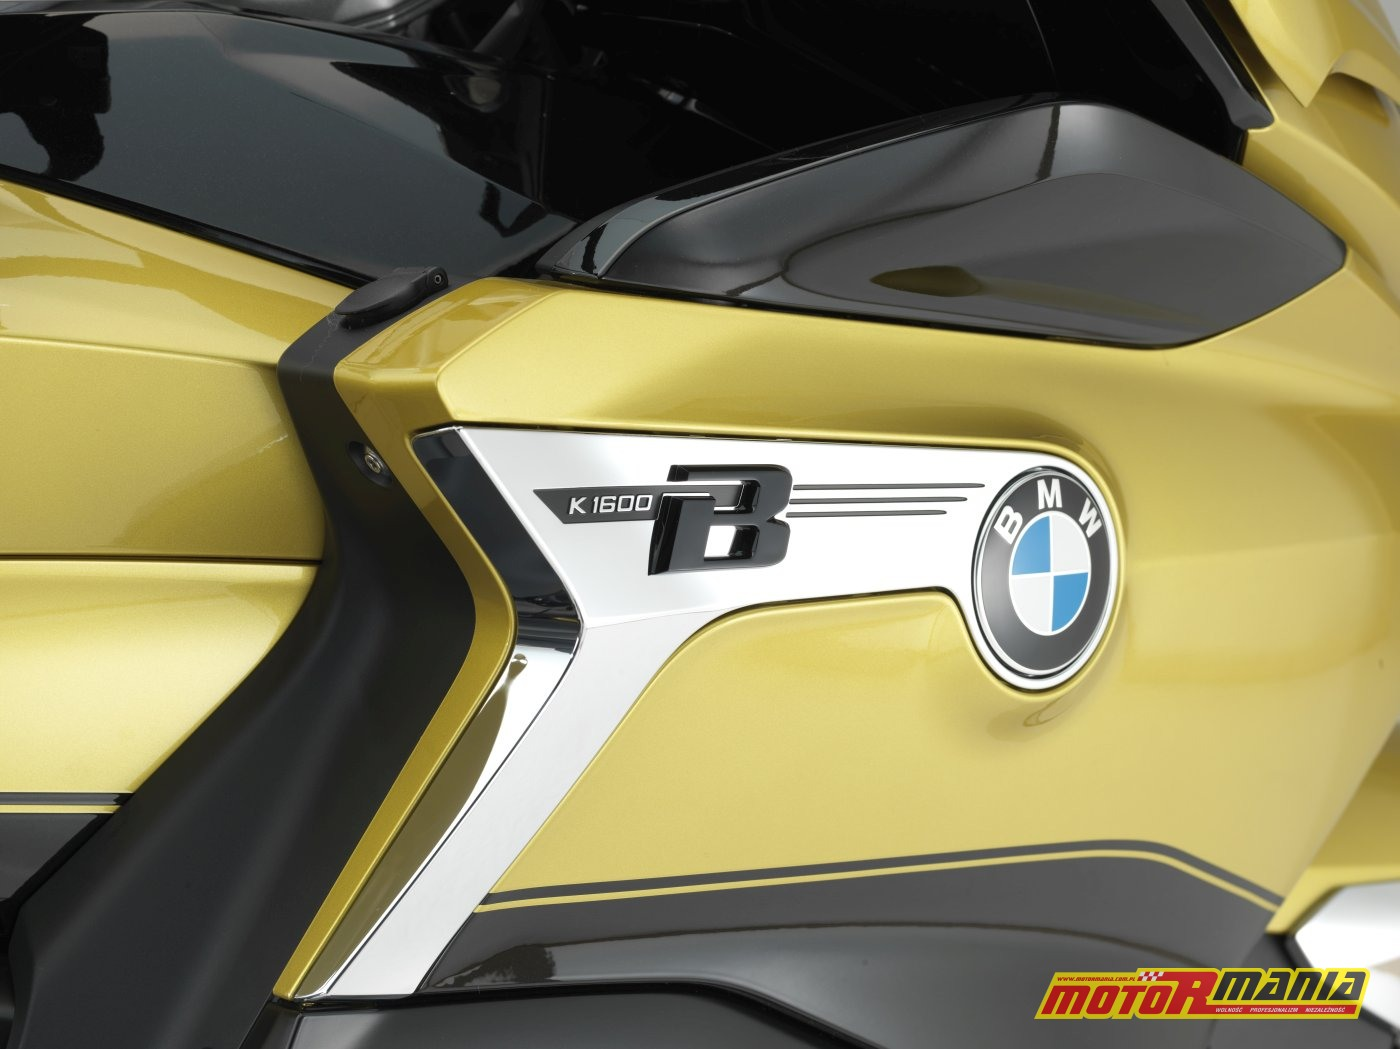 BMW K1600 Grand America 2018 (17)